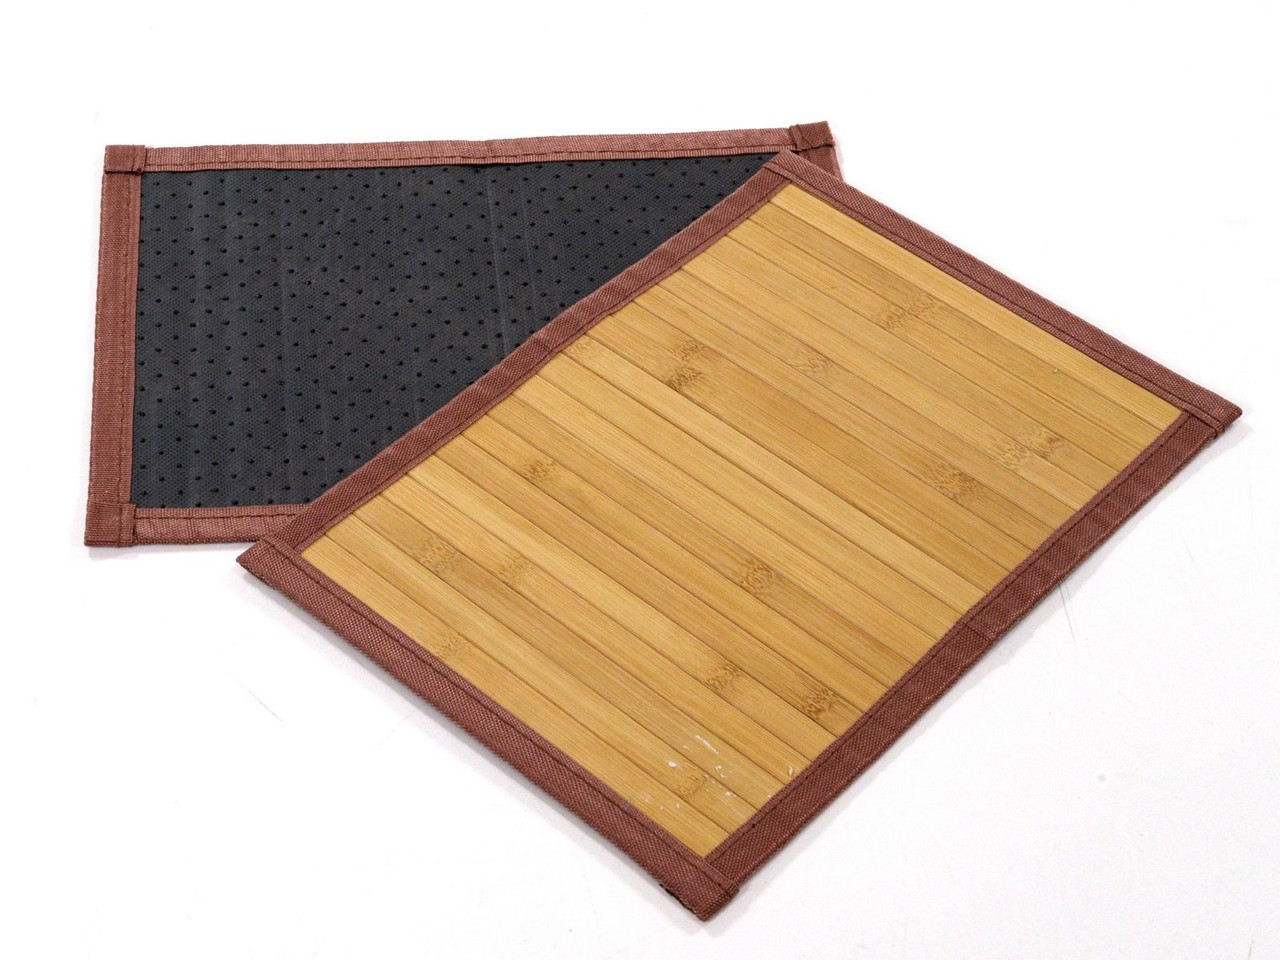 Amazing tappeti grandi with tappeti grandi for Ikea tappeti grandi dimensioni